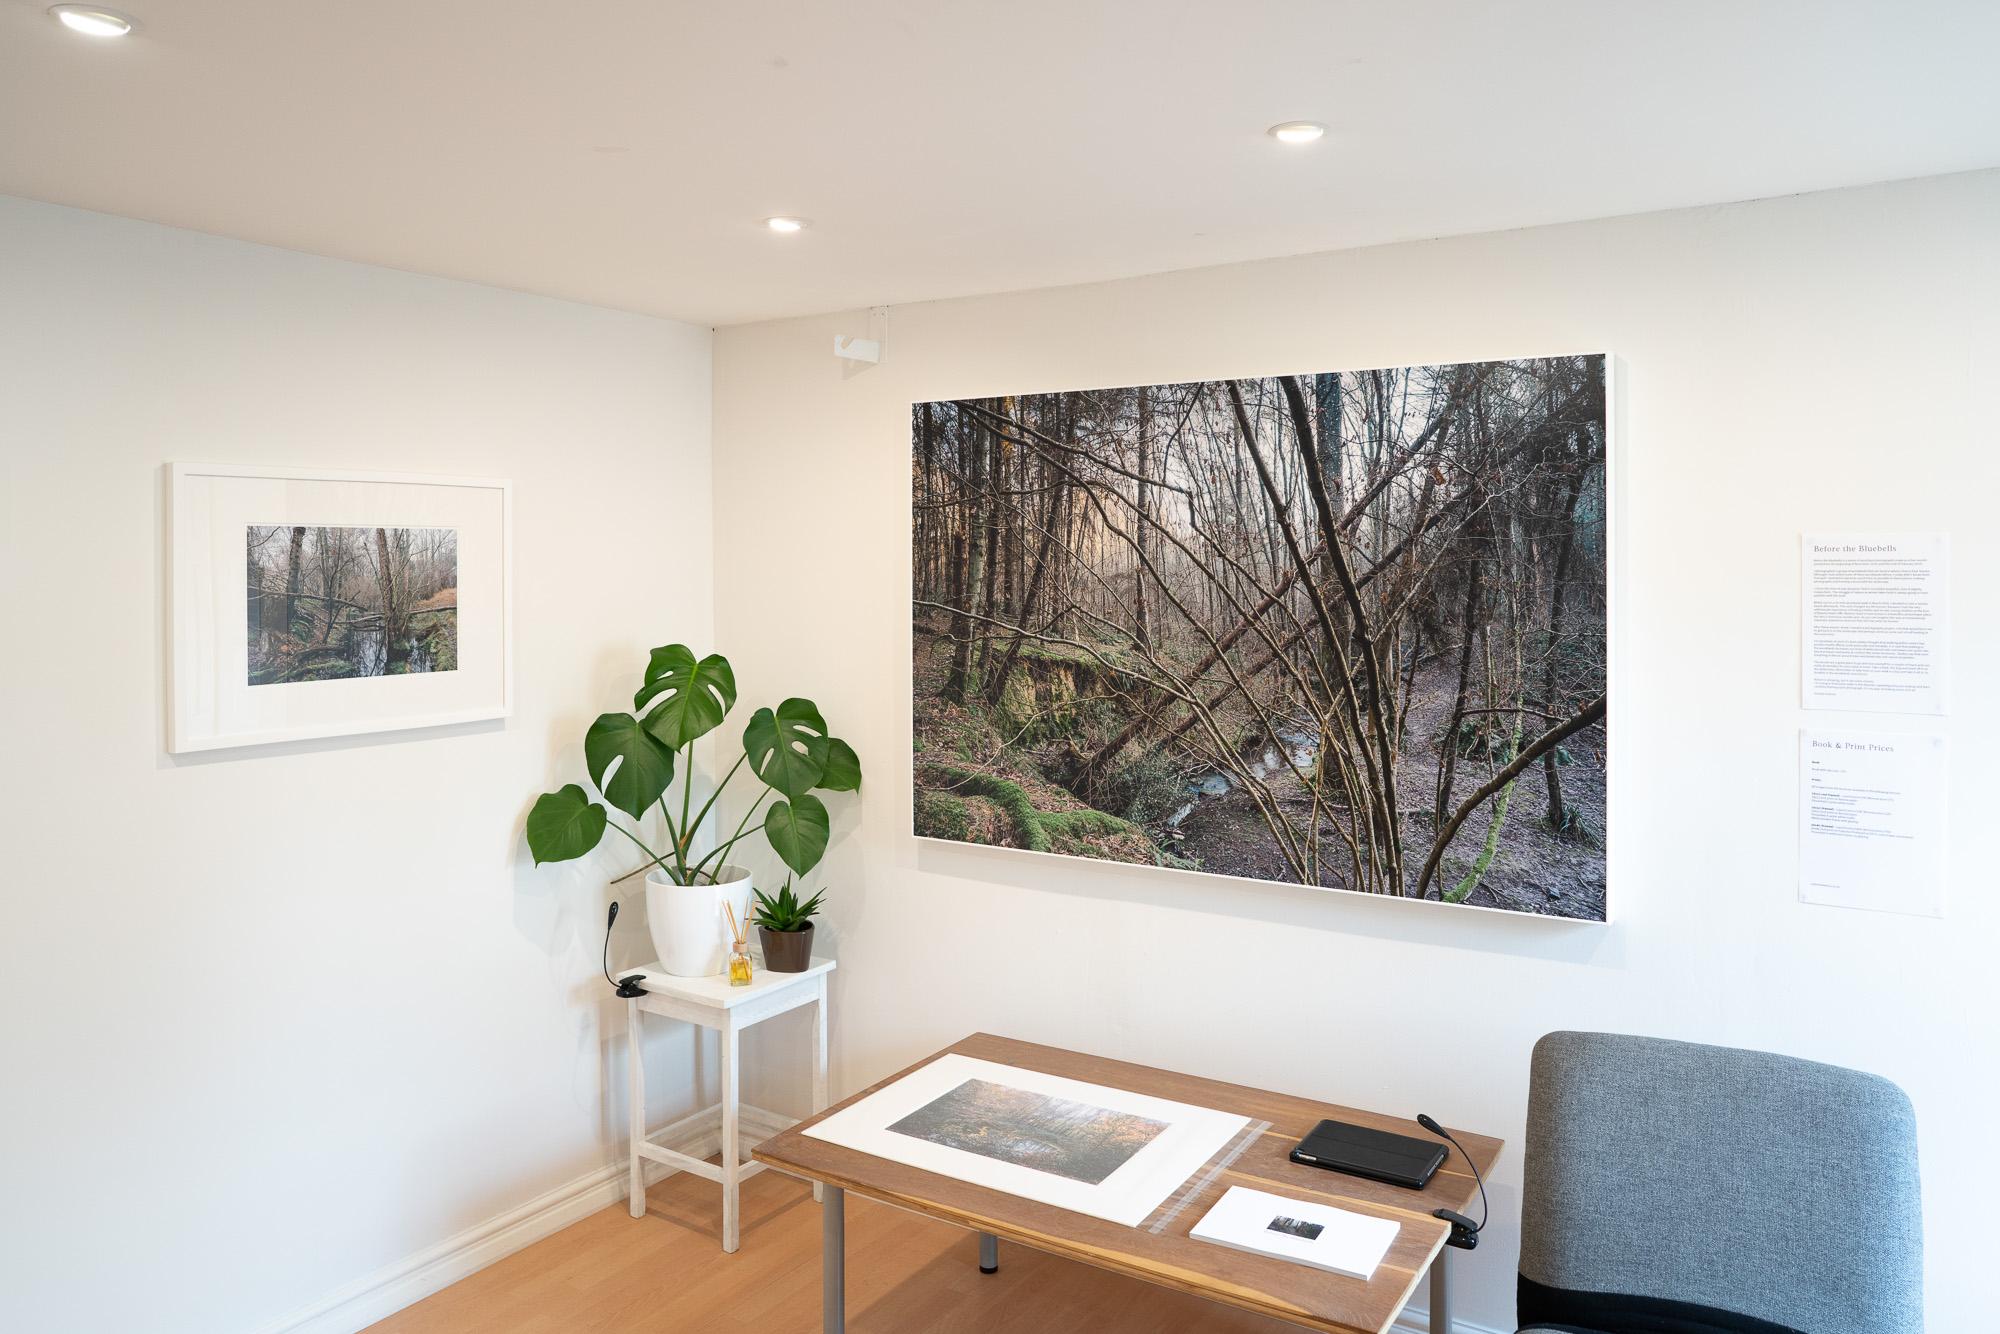 18x12 inch framed print and 60x40 inch framed print.